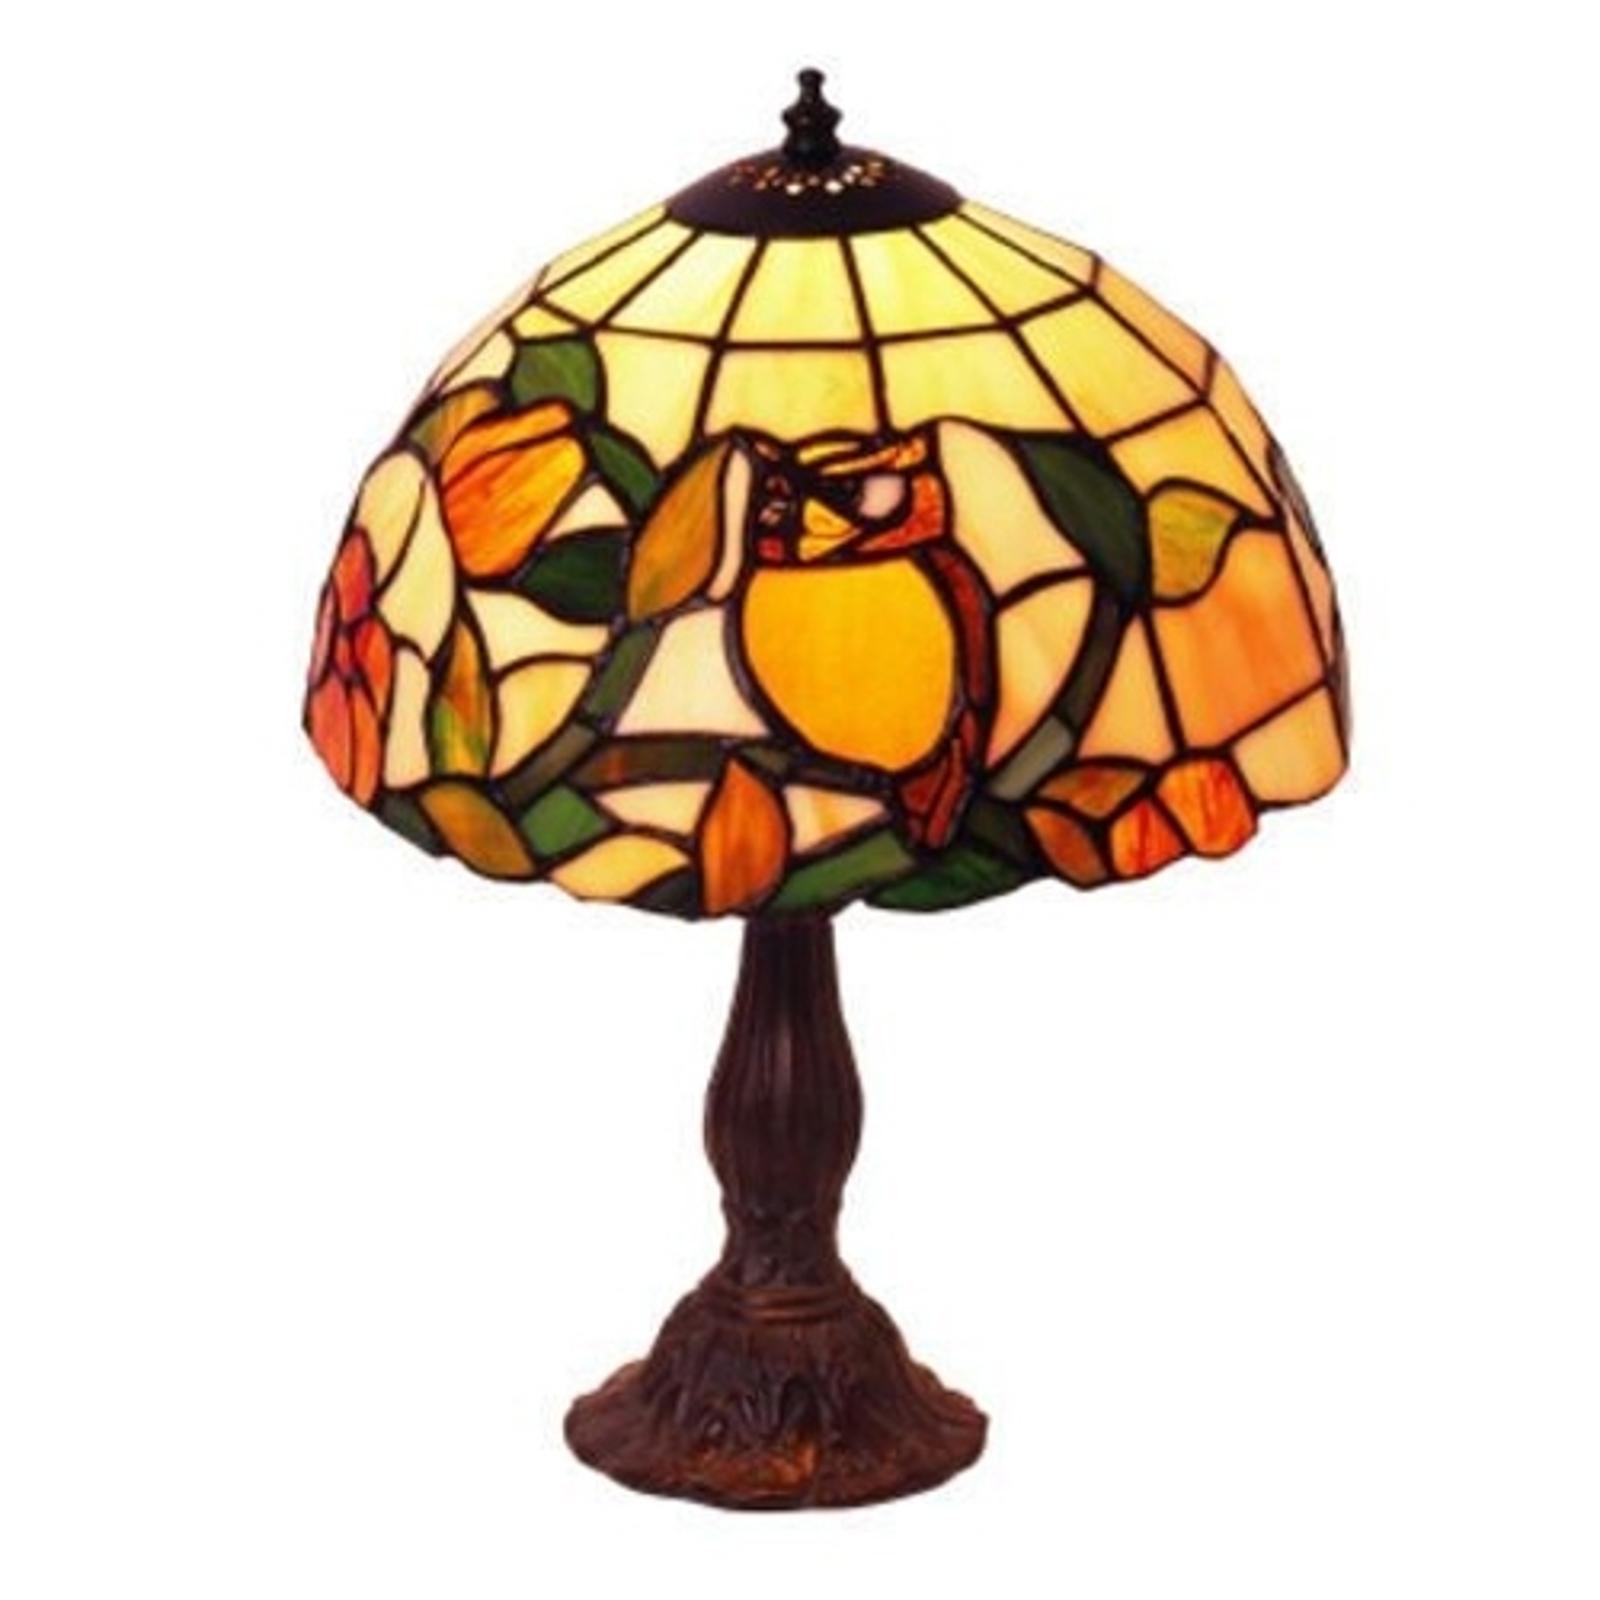 Tafellamp JULIANA met motief in Tiffany-stijl